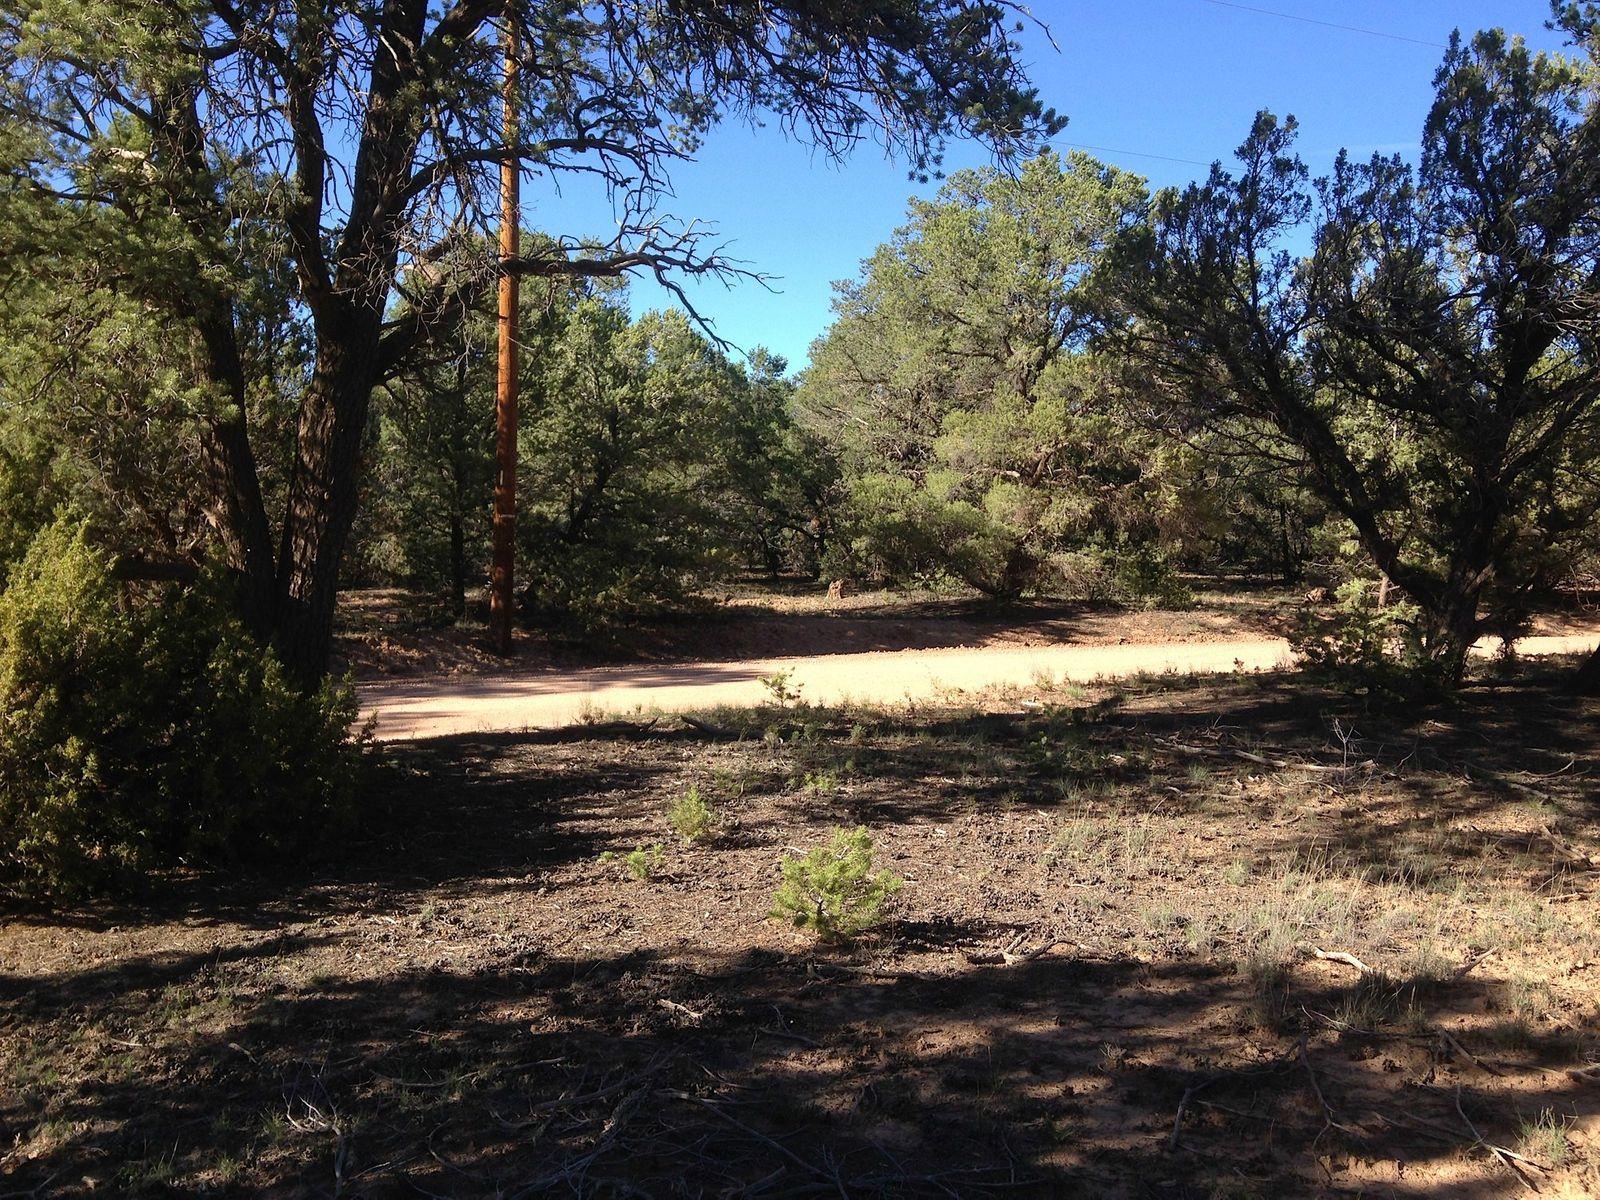 Apache Ridge, Tract 3-B (Mescalero Trail